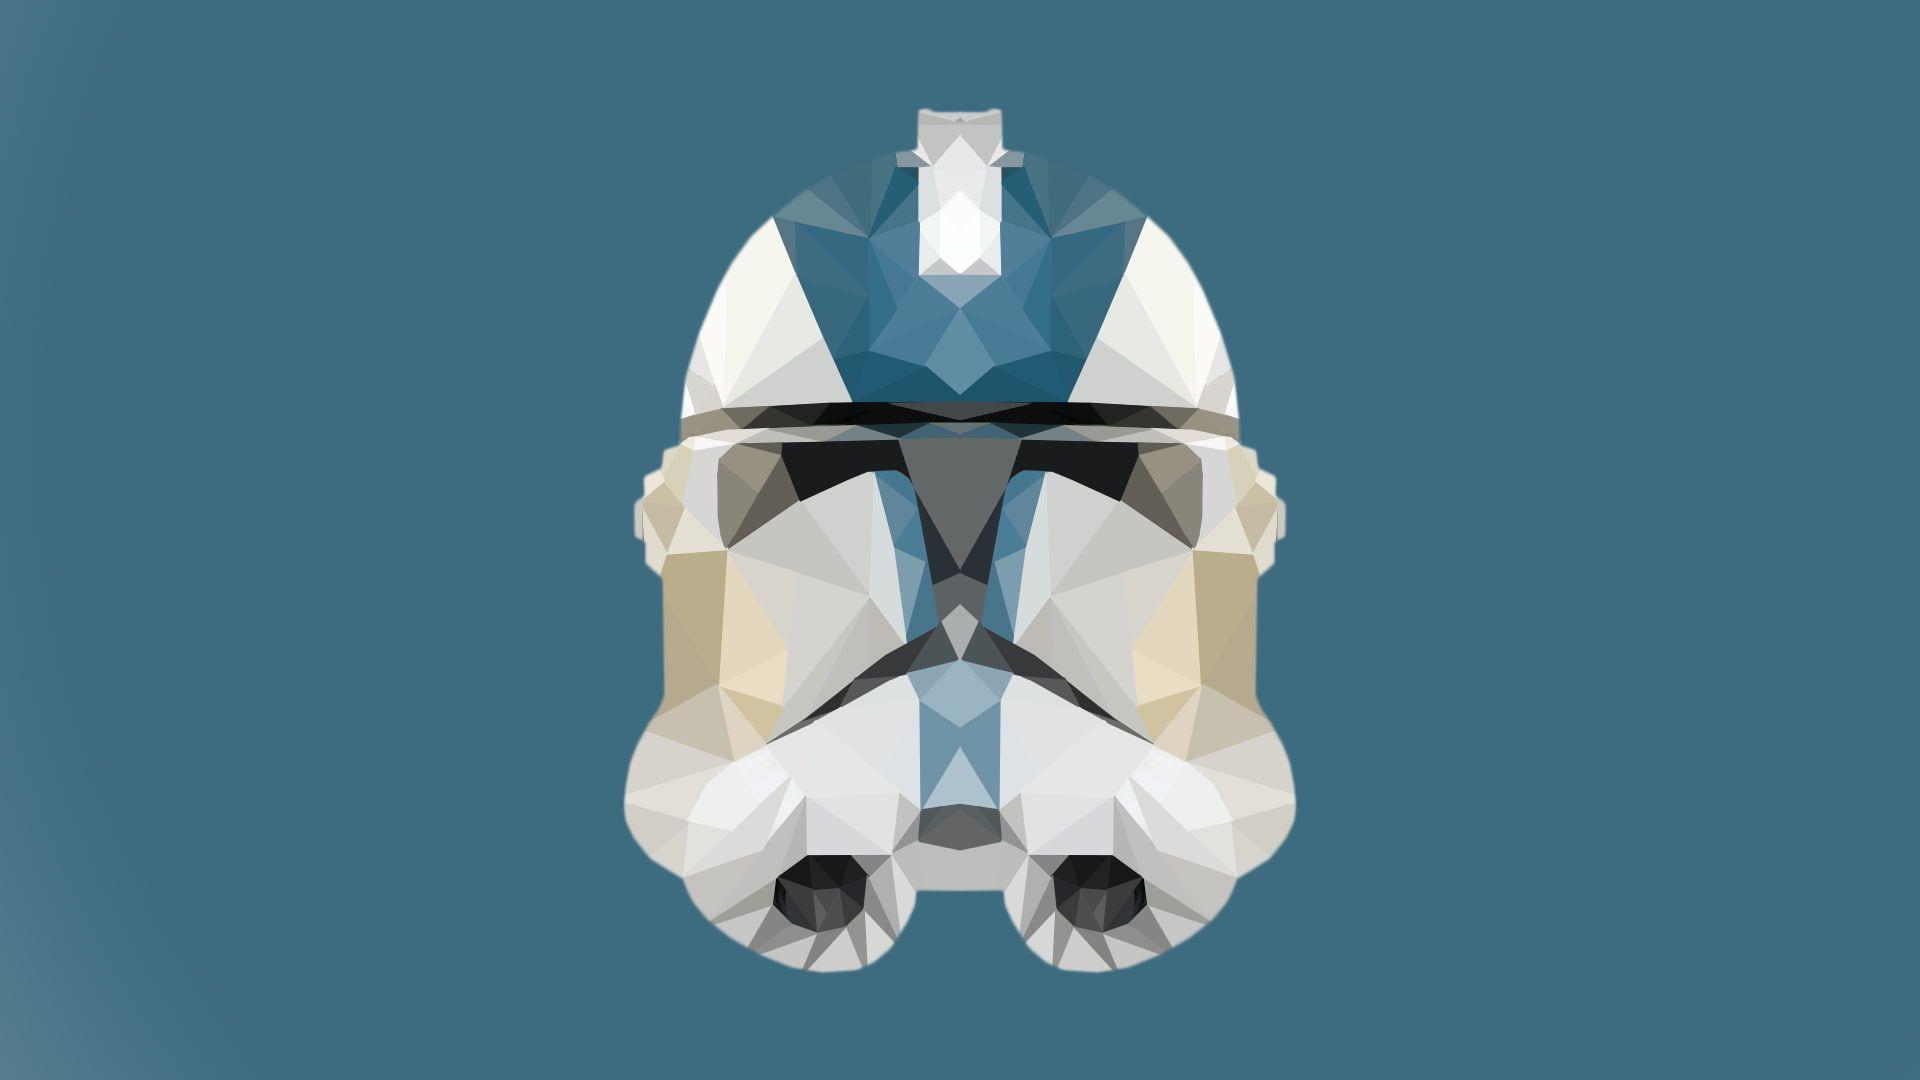 Clonetrooper Simple Background Minimalism Star Wars Simple 1080p Wallpaper Hdwallpaper Desktop Simple Backgrounds Star Wars Stormtrooper Wallpaper